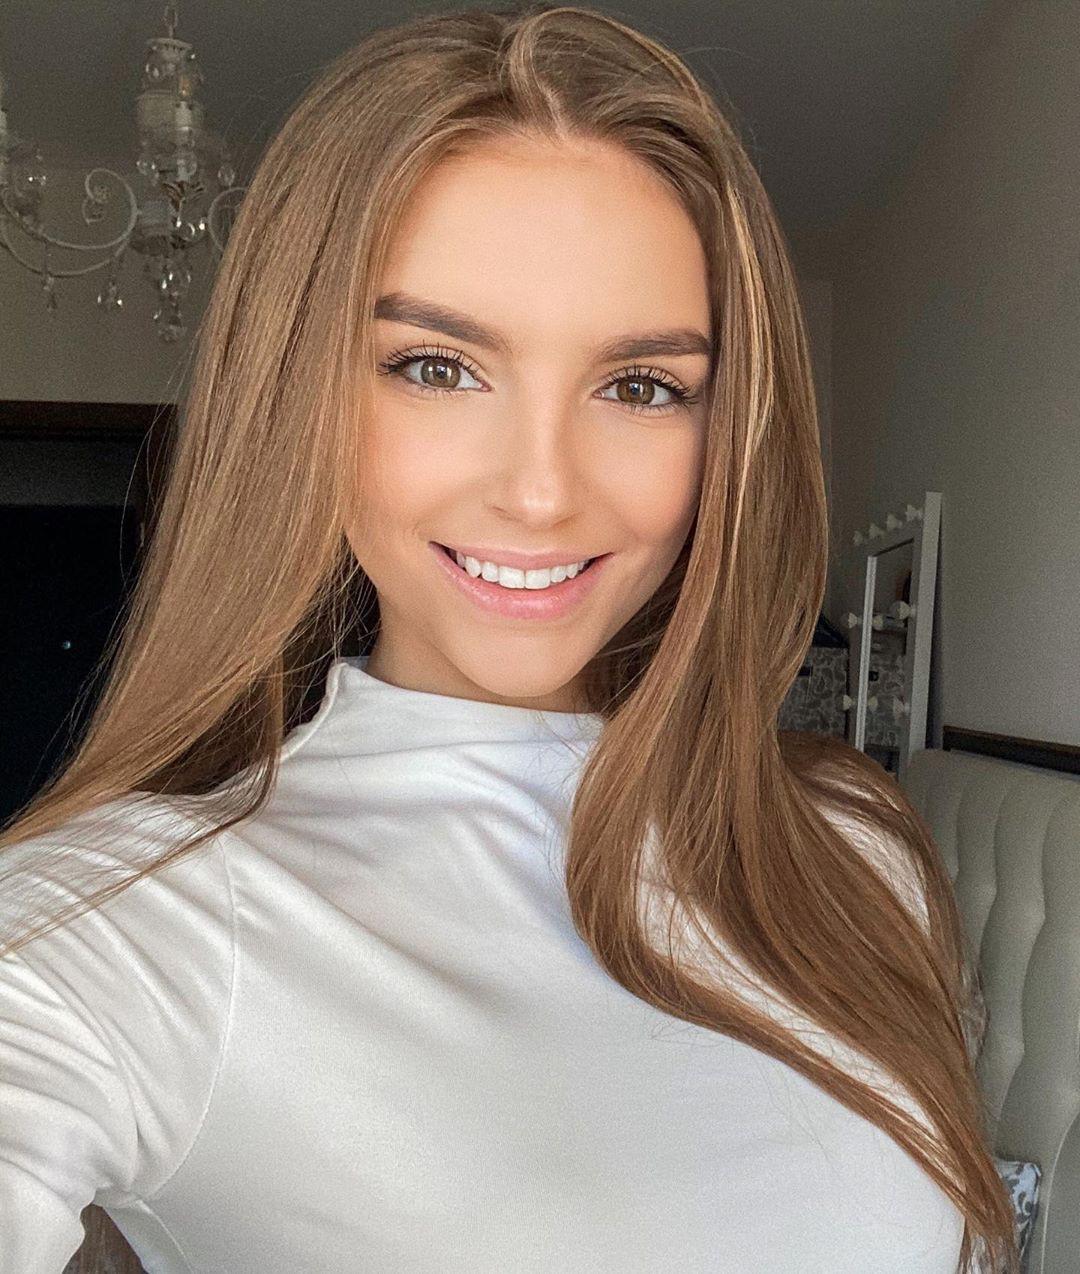 Galina Dub blond hairstyle, Cute Girls Face, Beautiful Lips